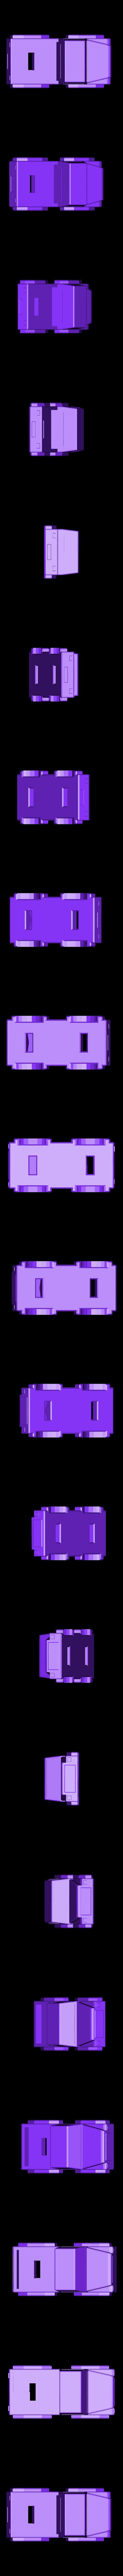 SmallToys-BodyCar6.stl Download STL file SmallToys - Cars pack • 3D print design, Wabby